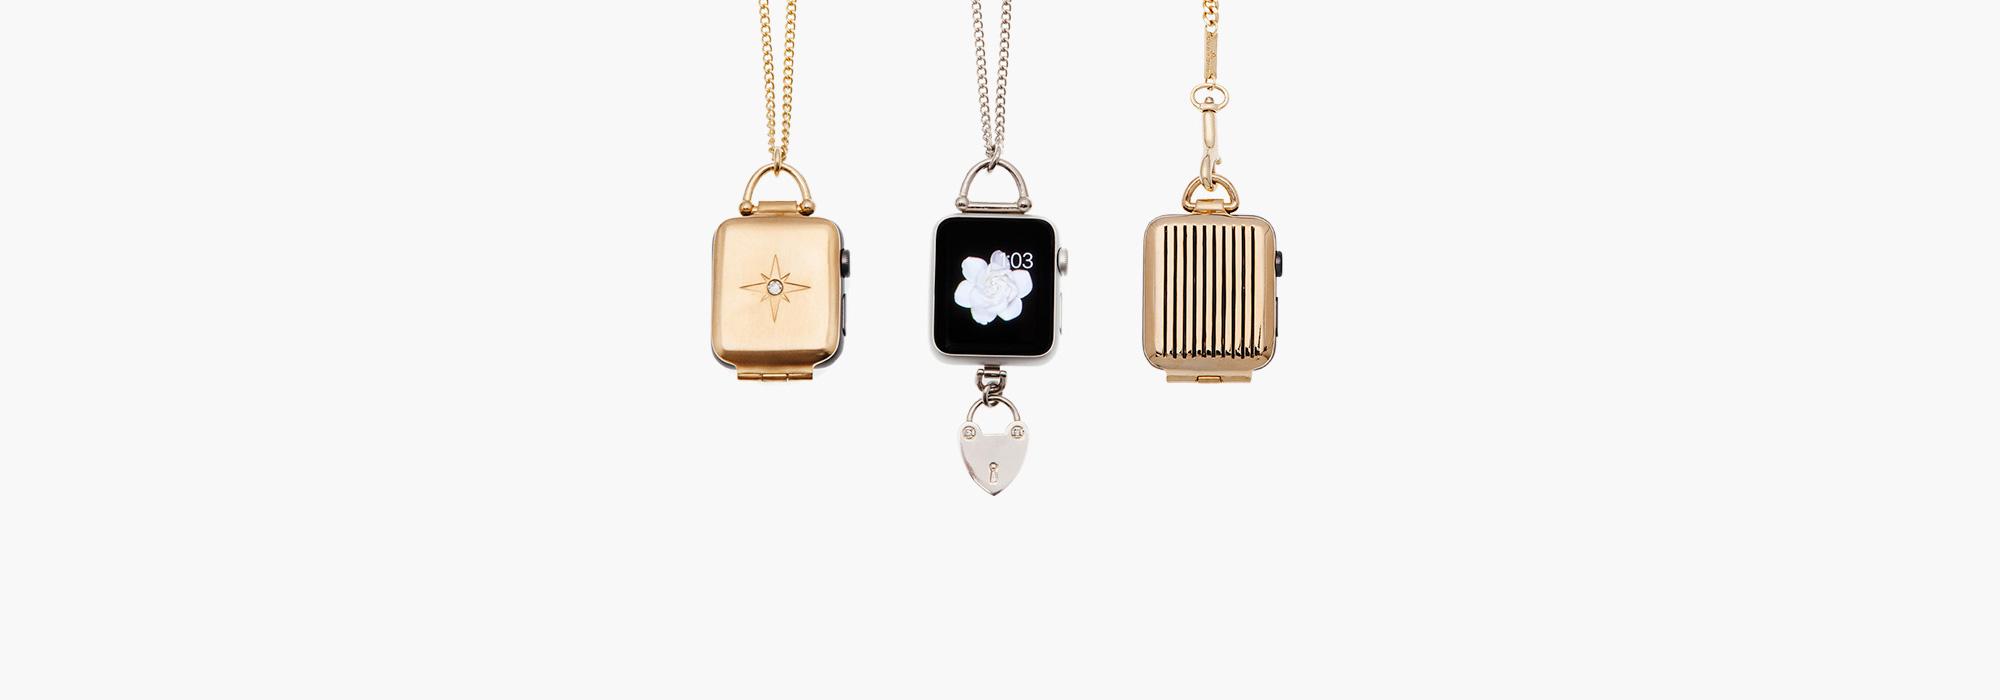 Bucardo-Pendulum-Collection